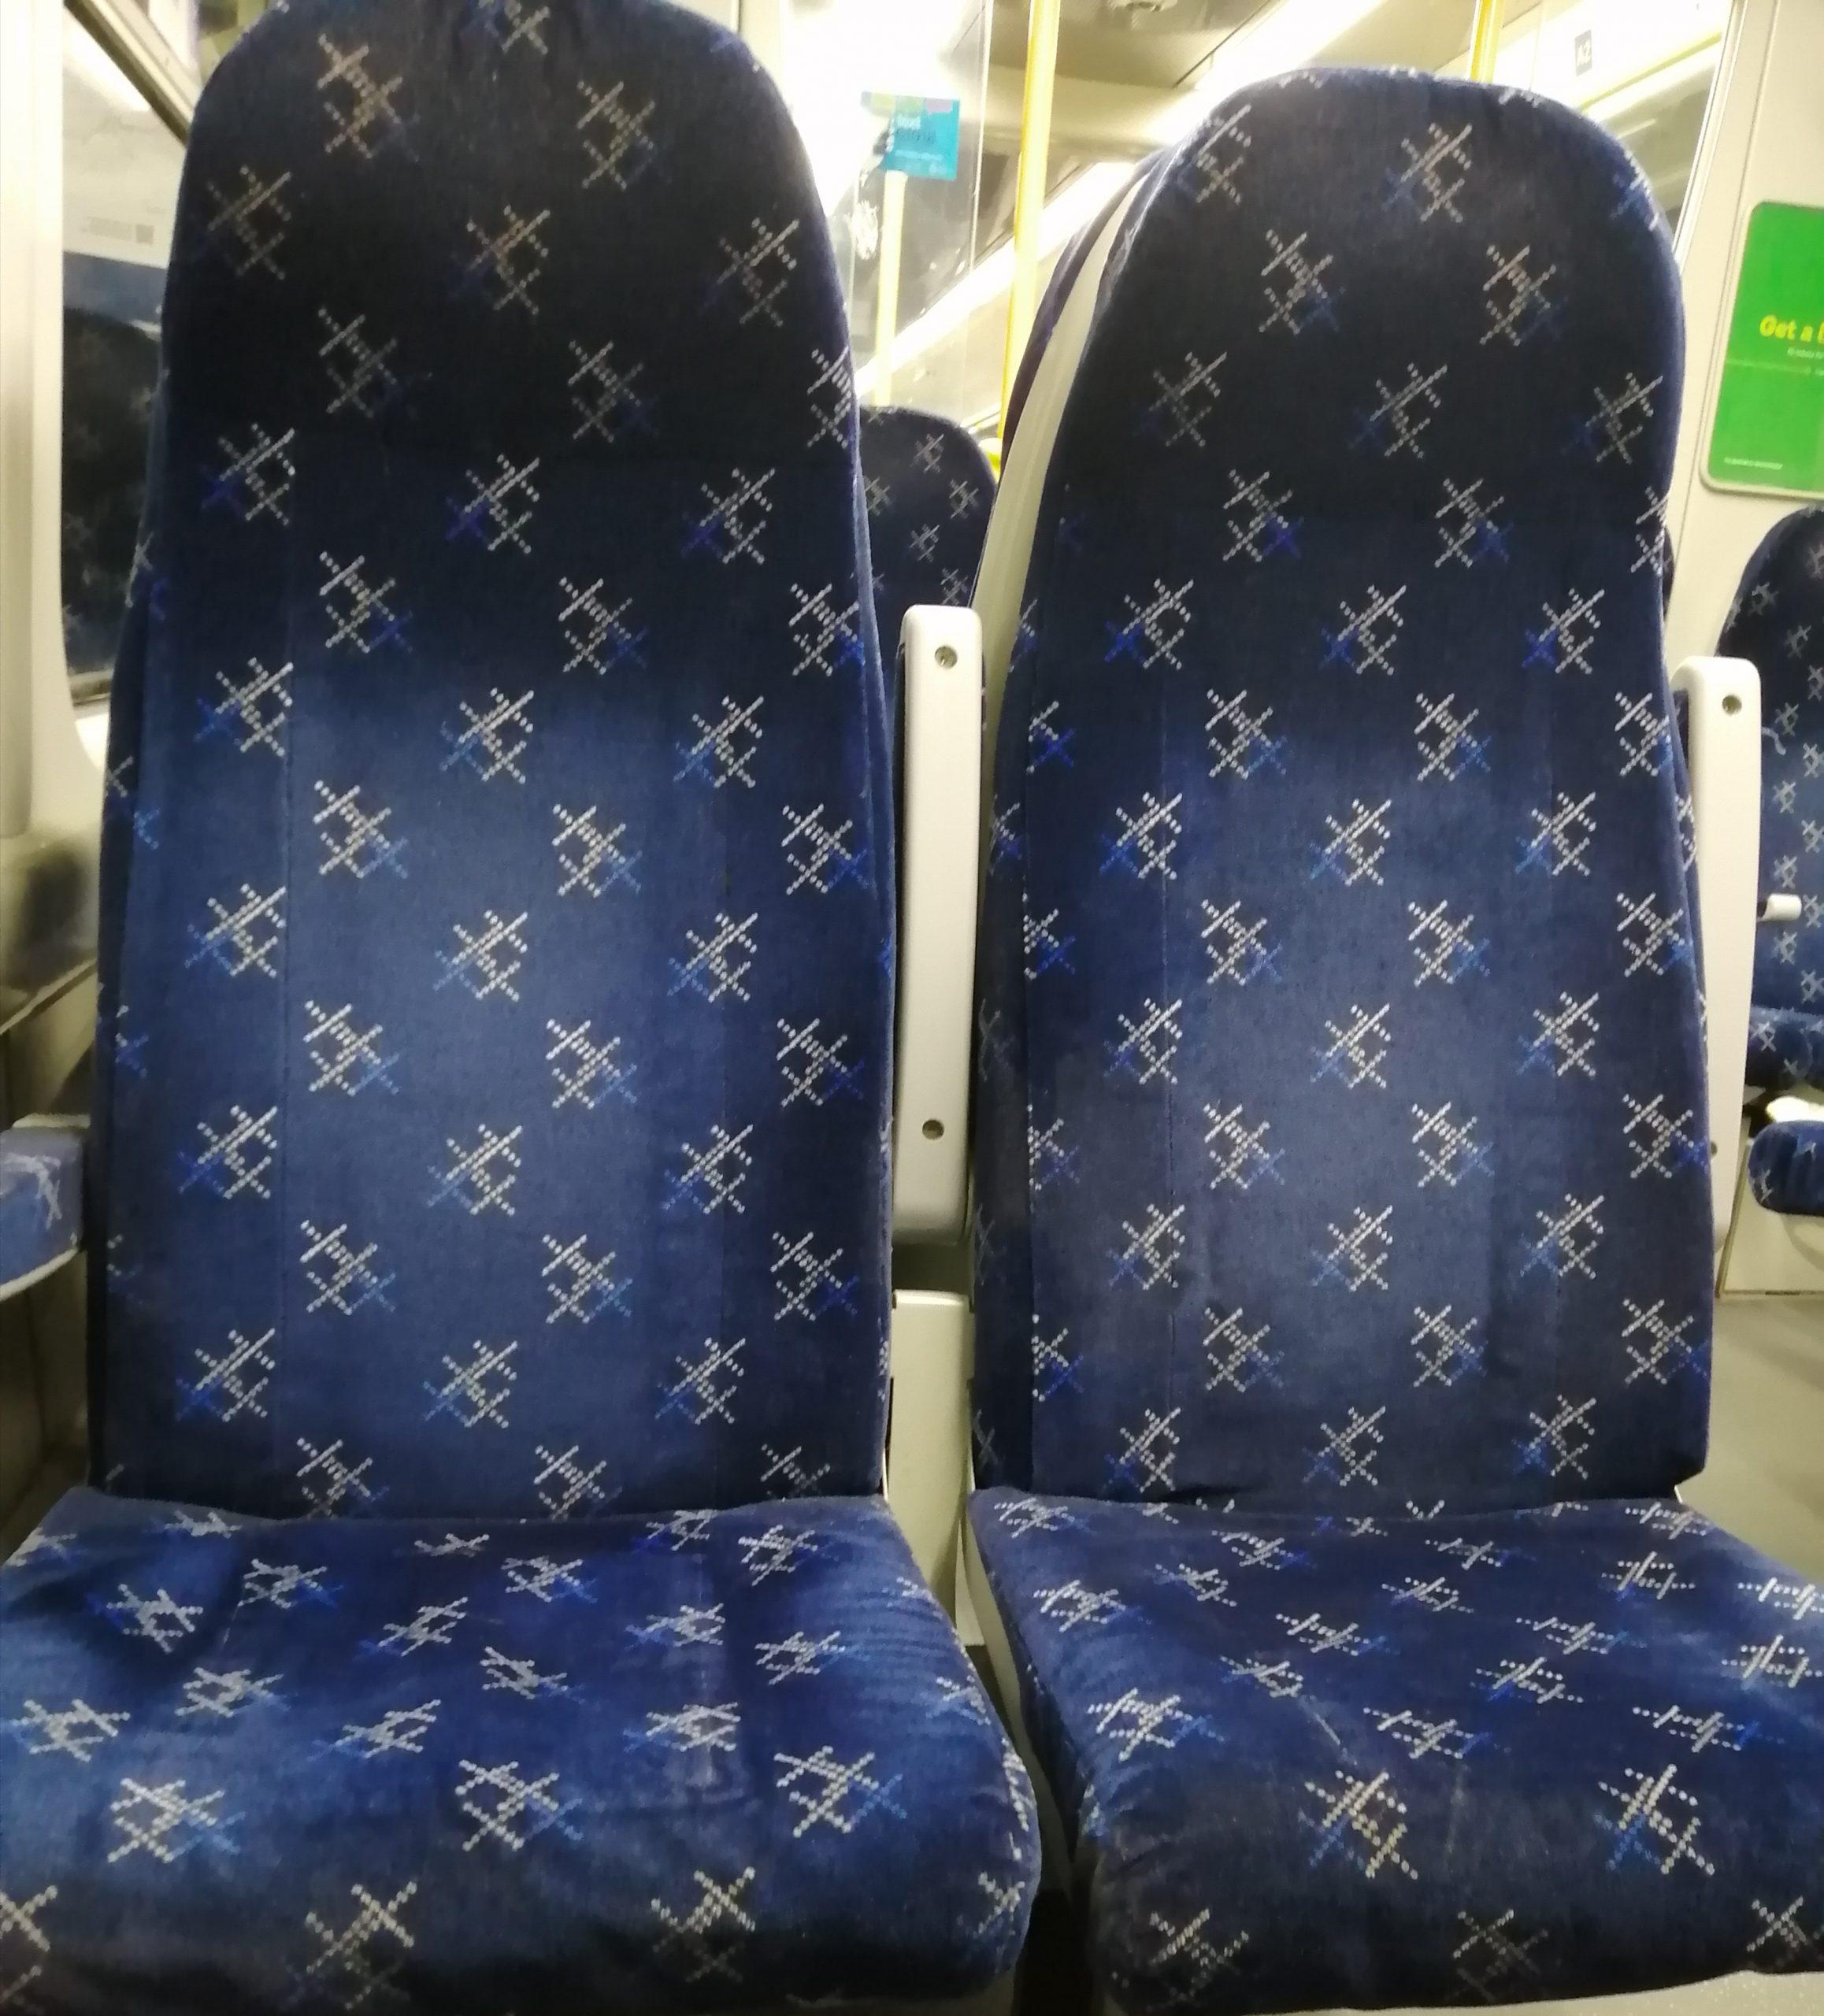 Train - Travel News Scotland